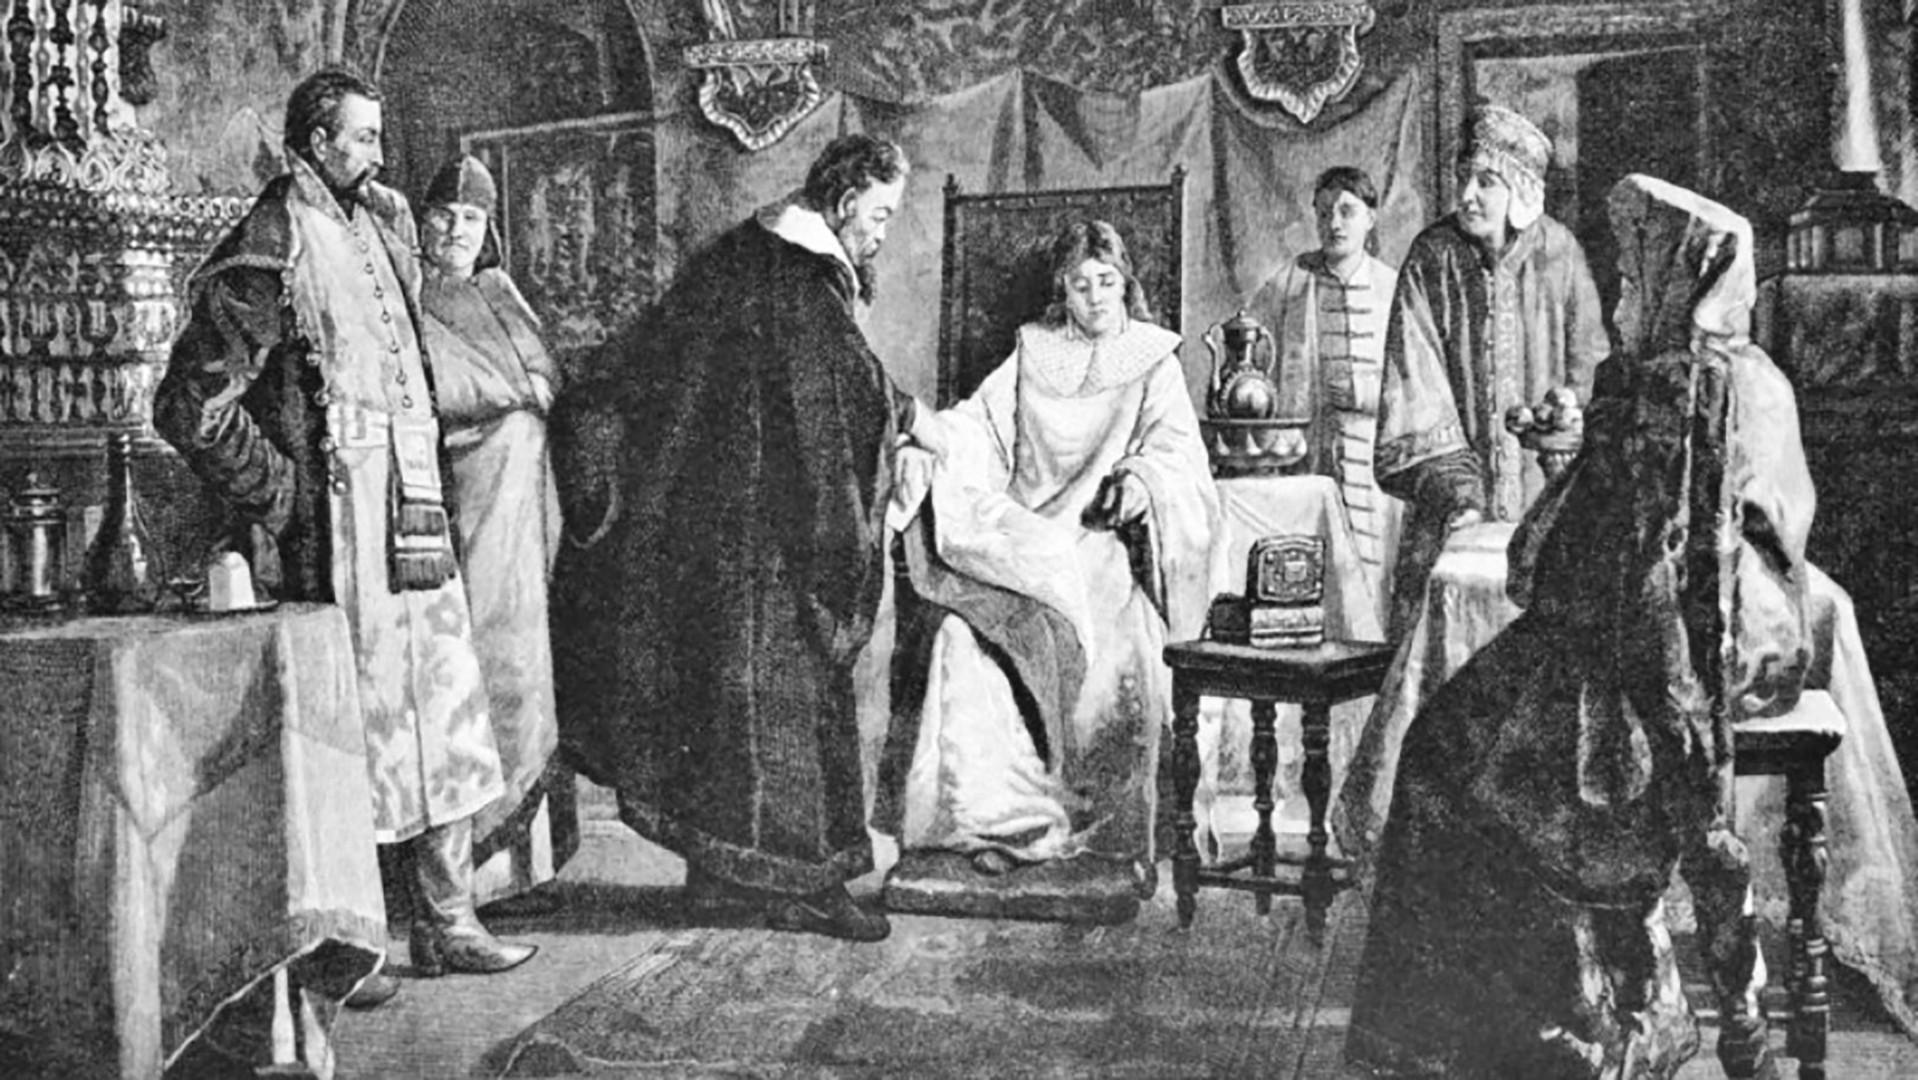 Марија Ивановна Хлопова, невеста цара Михаила Фјодоровича.